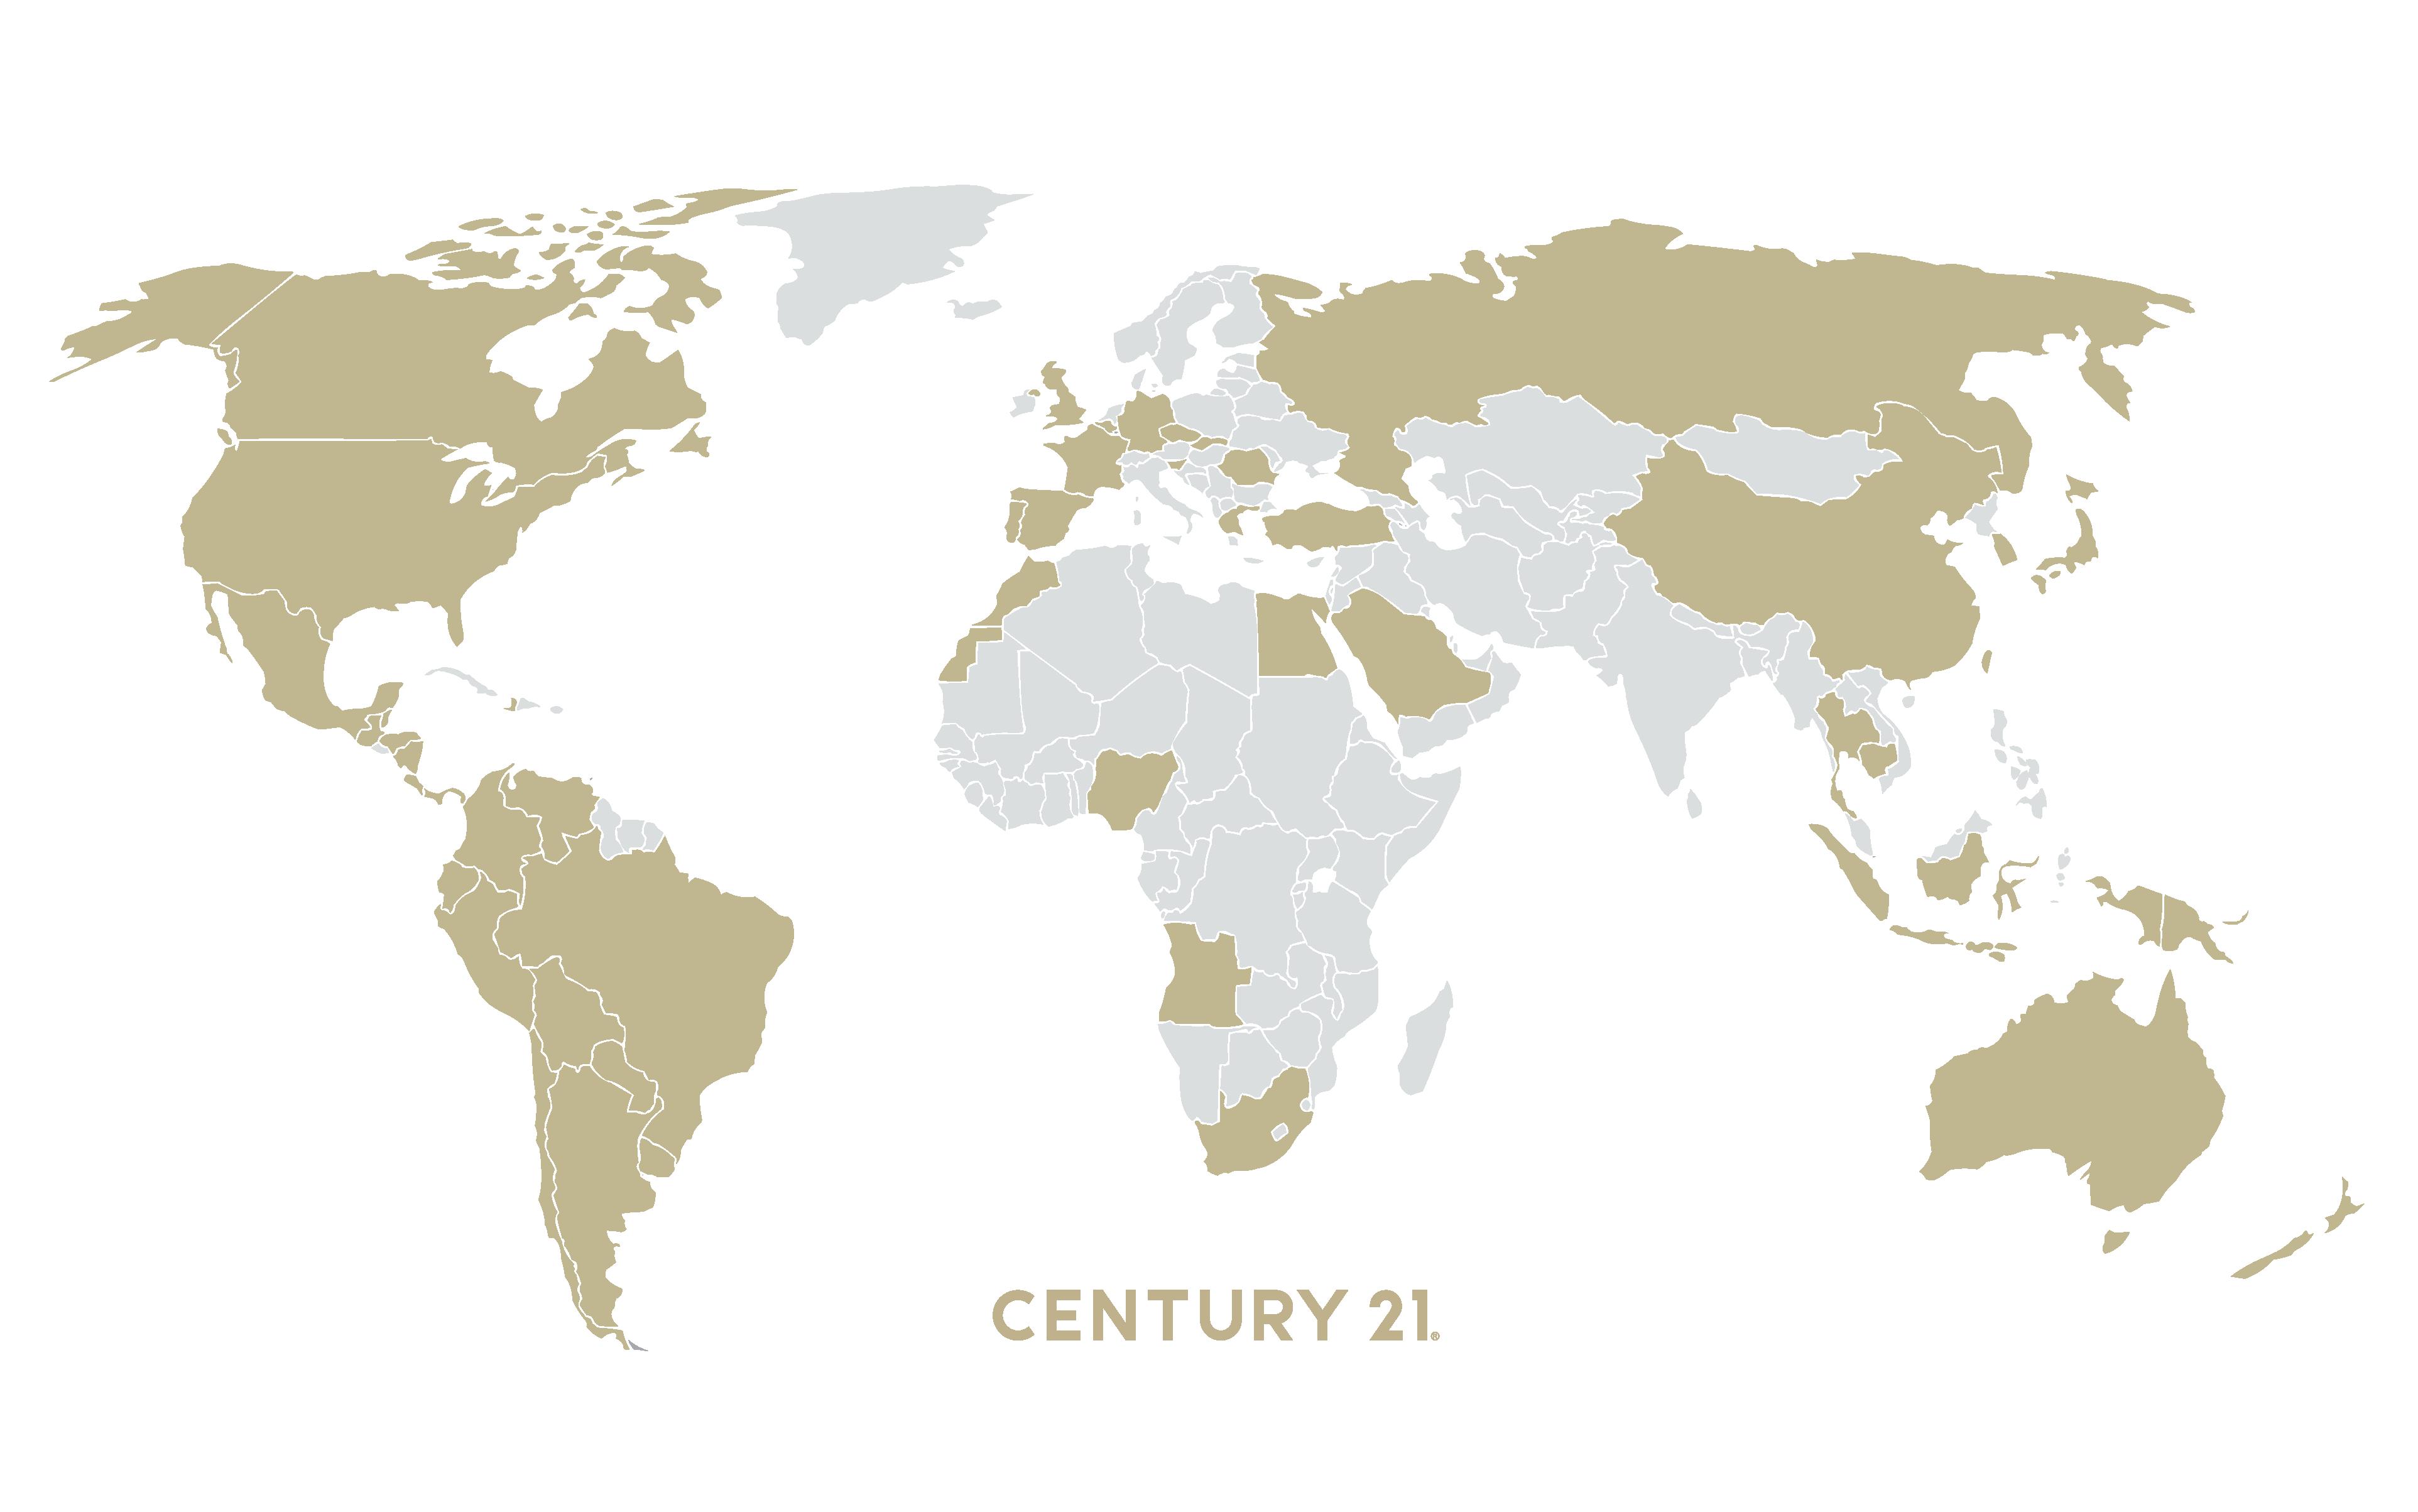 CENTURY 21 GLOBAL